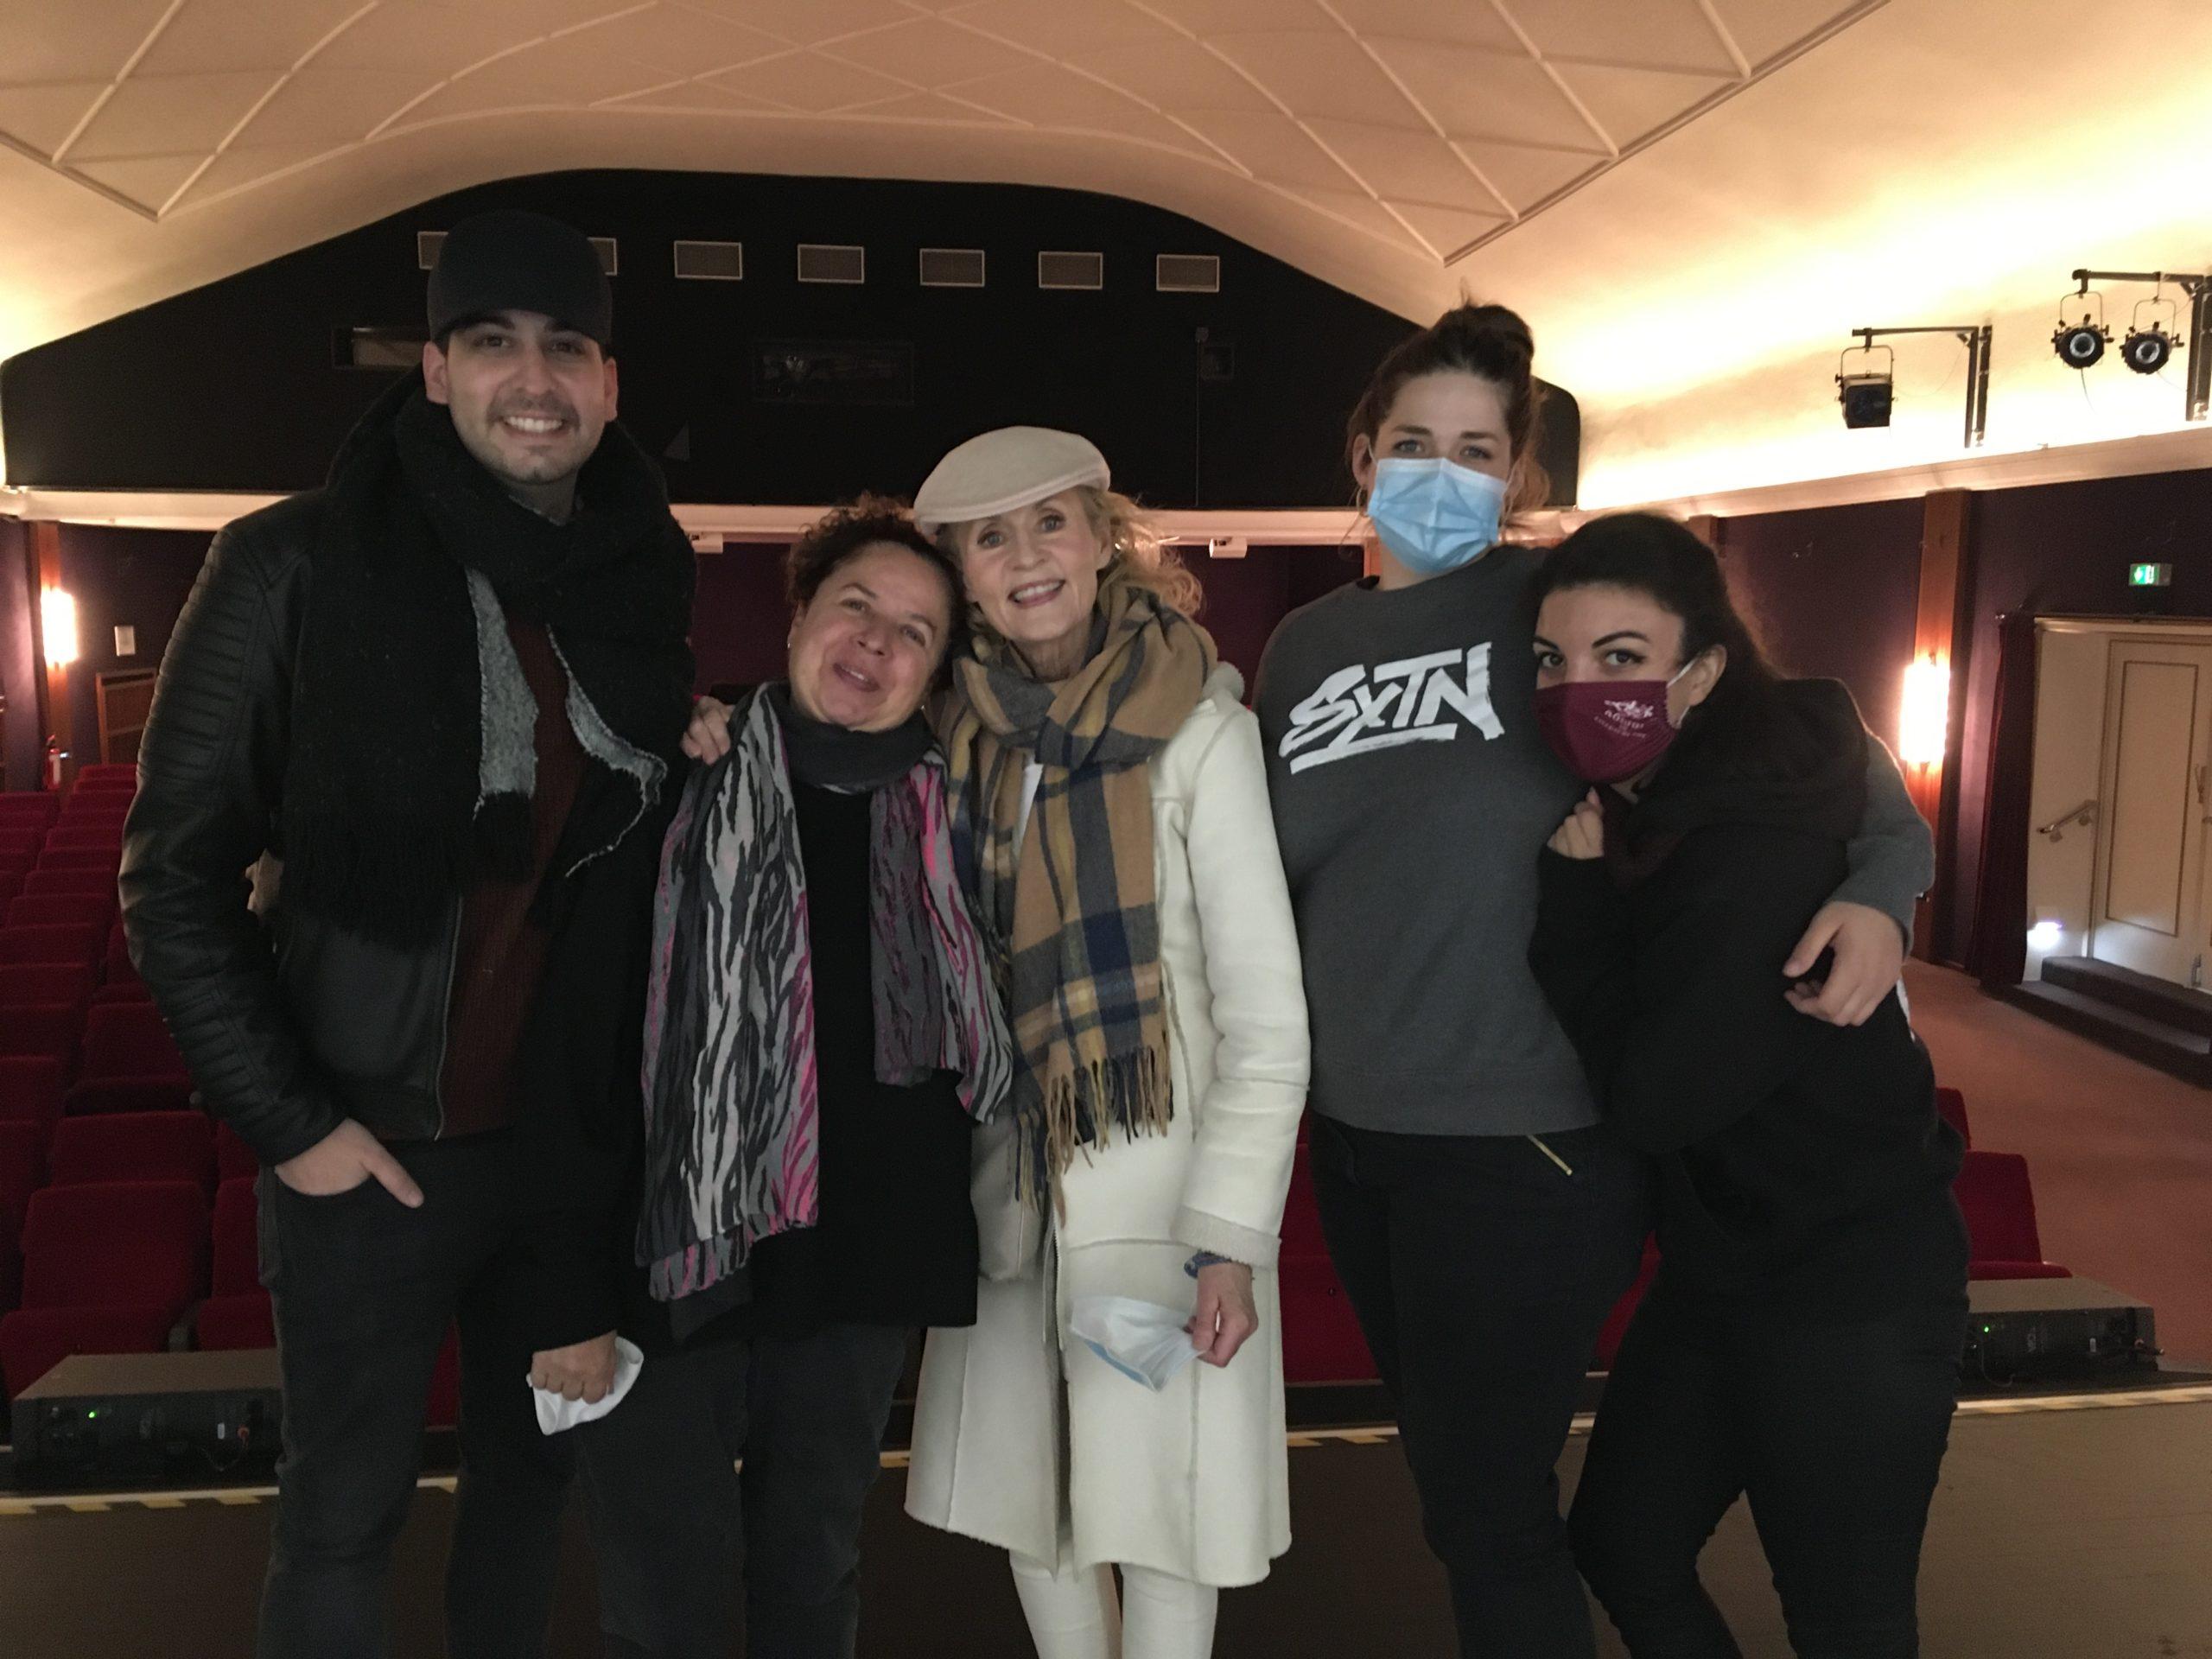 David Daria, Franziska Traub, Kerstin Fernström, Verena Mittermeier, Manon Lespinasse